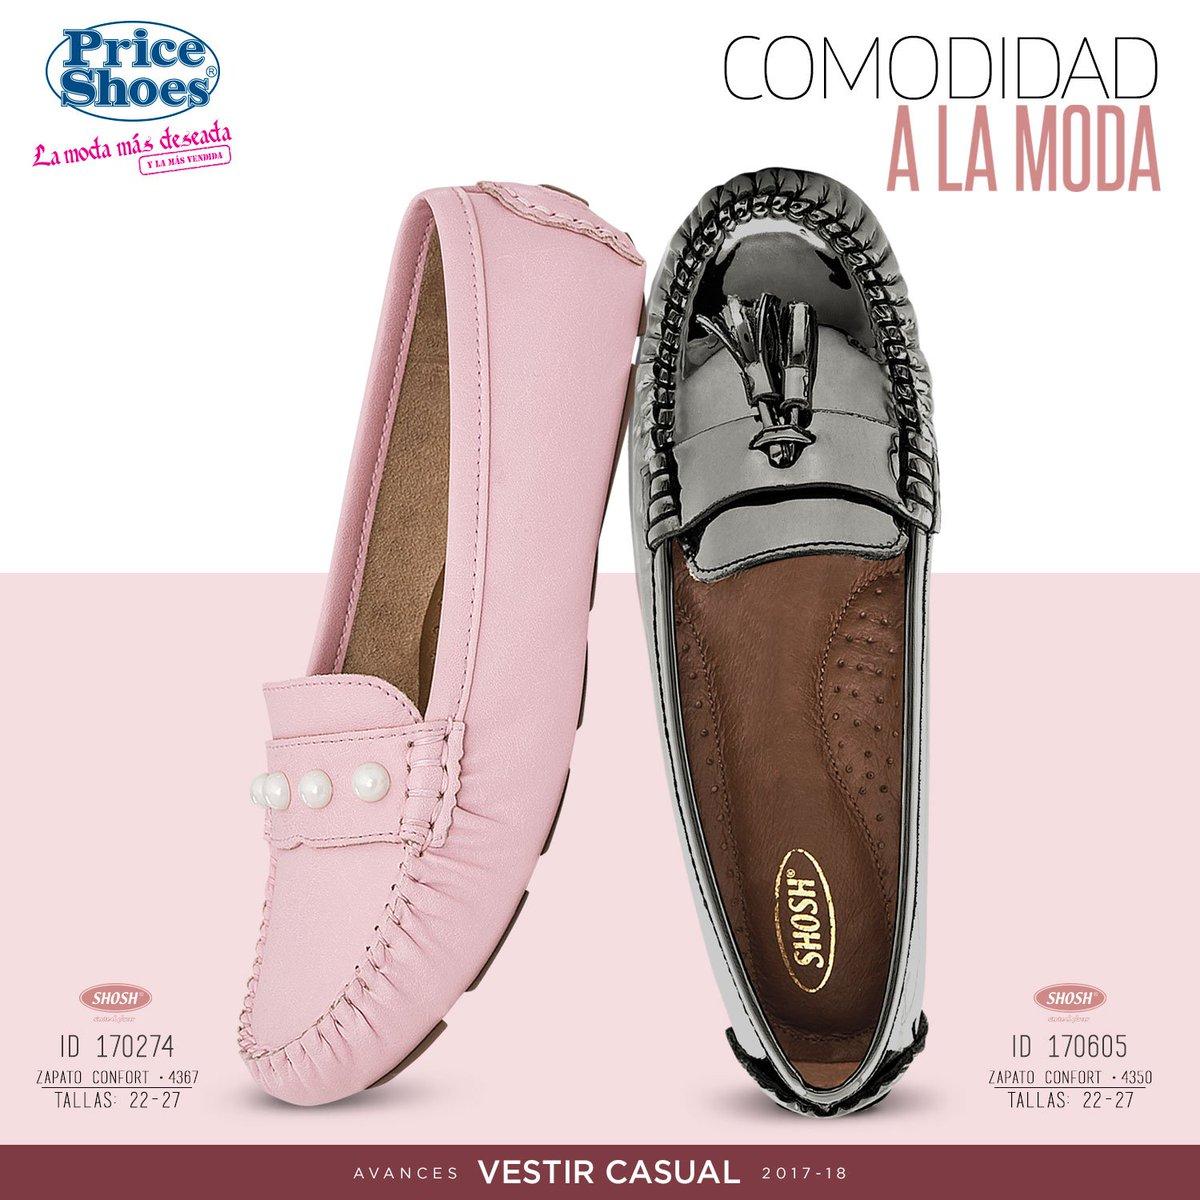 edda384d47 Price Shoes on Twitter